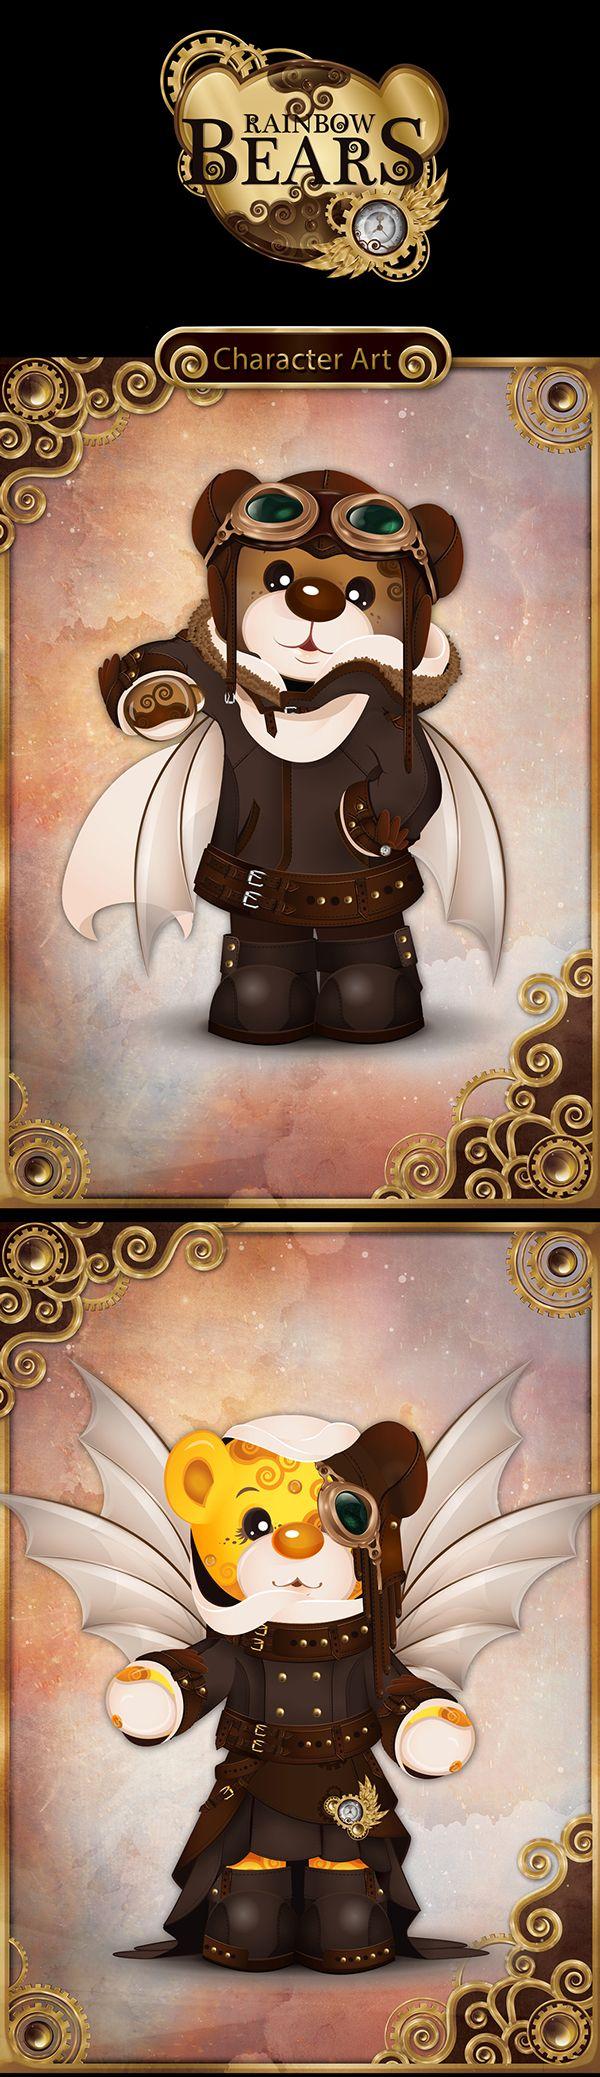 Steampunk bears: character arts